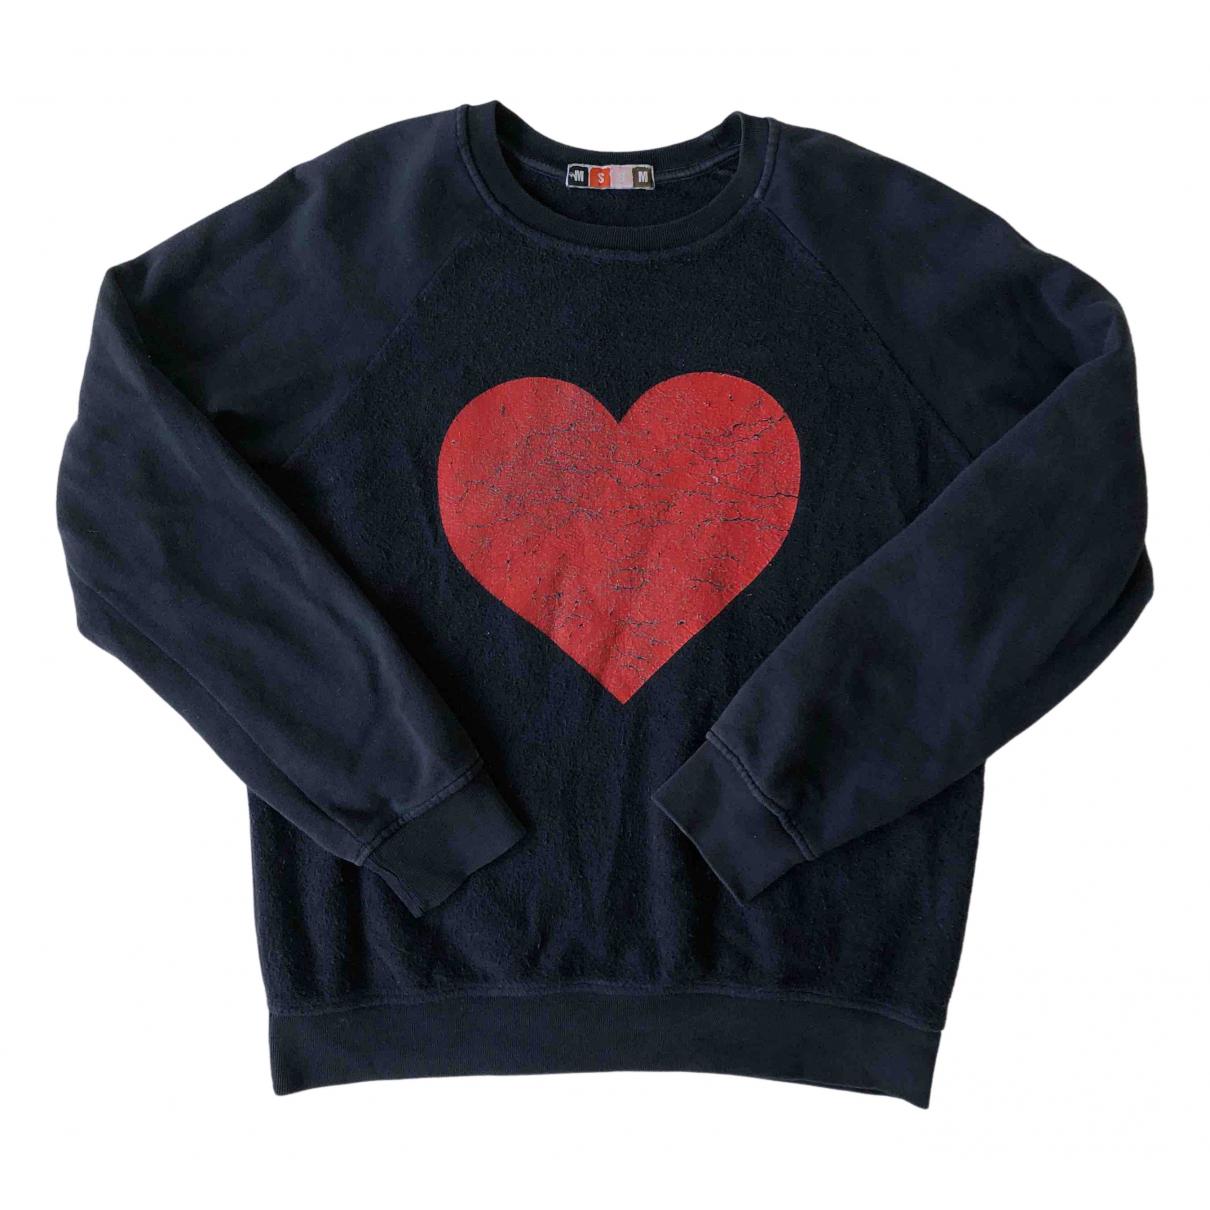 Msgm N Navy Cotton Knitwear for Women S International